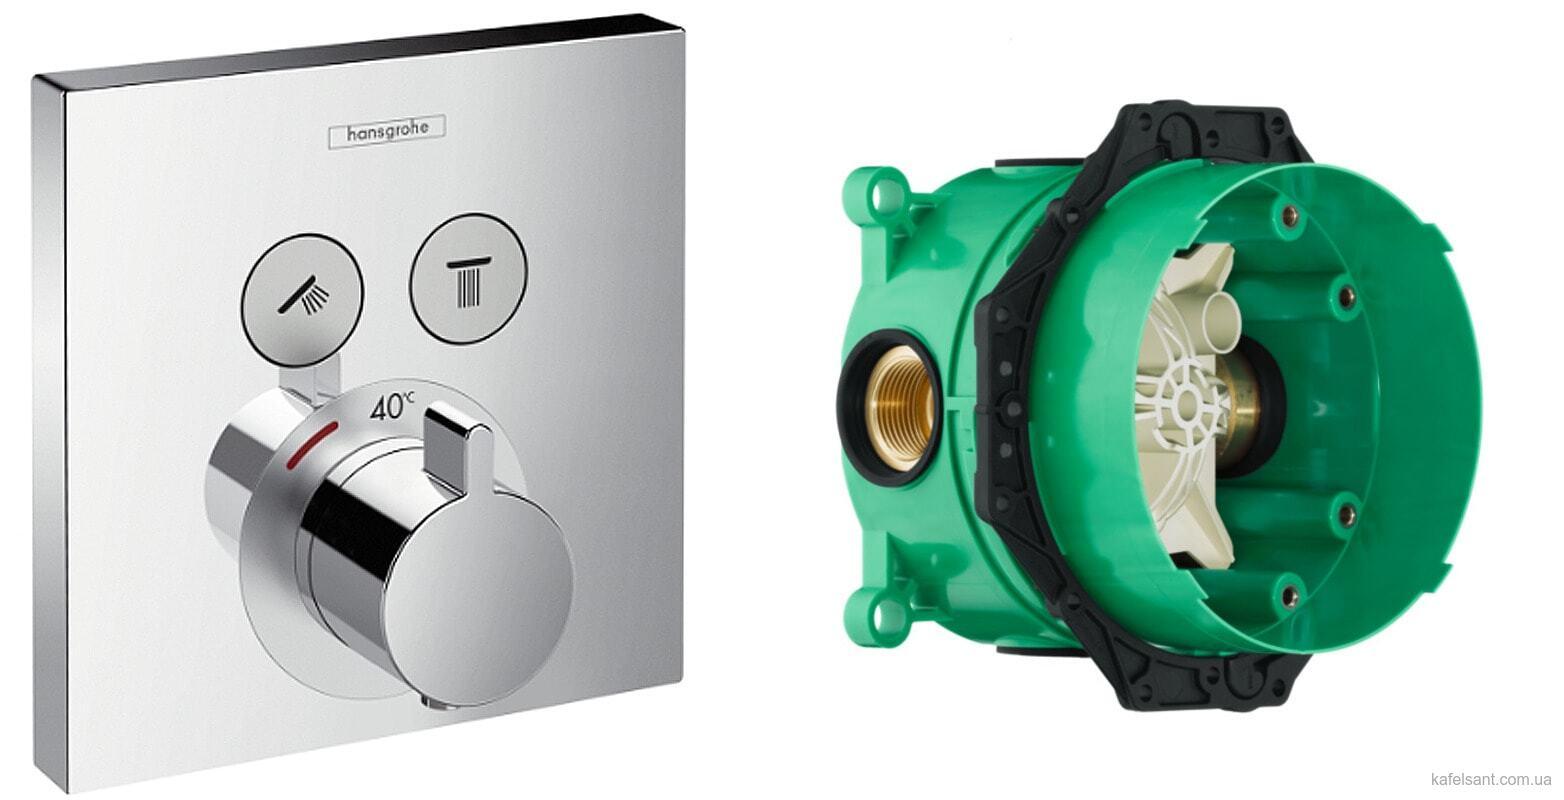 термостат Hansgrohe Showerselect 15763000 скрытая часть Hansgrohe Ibox Universal 01800180